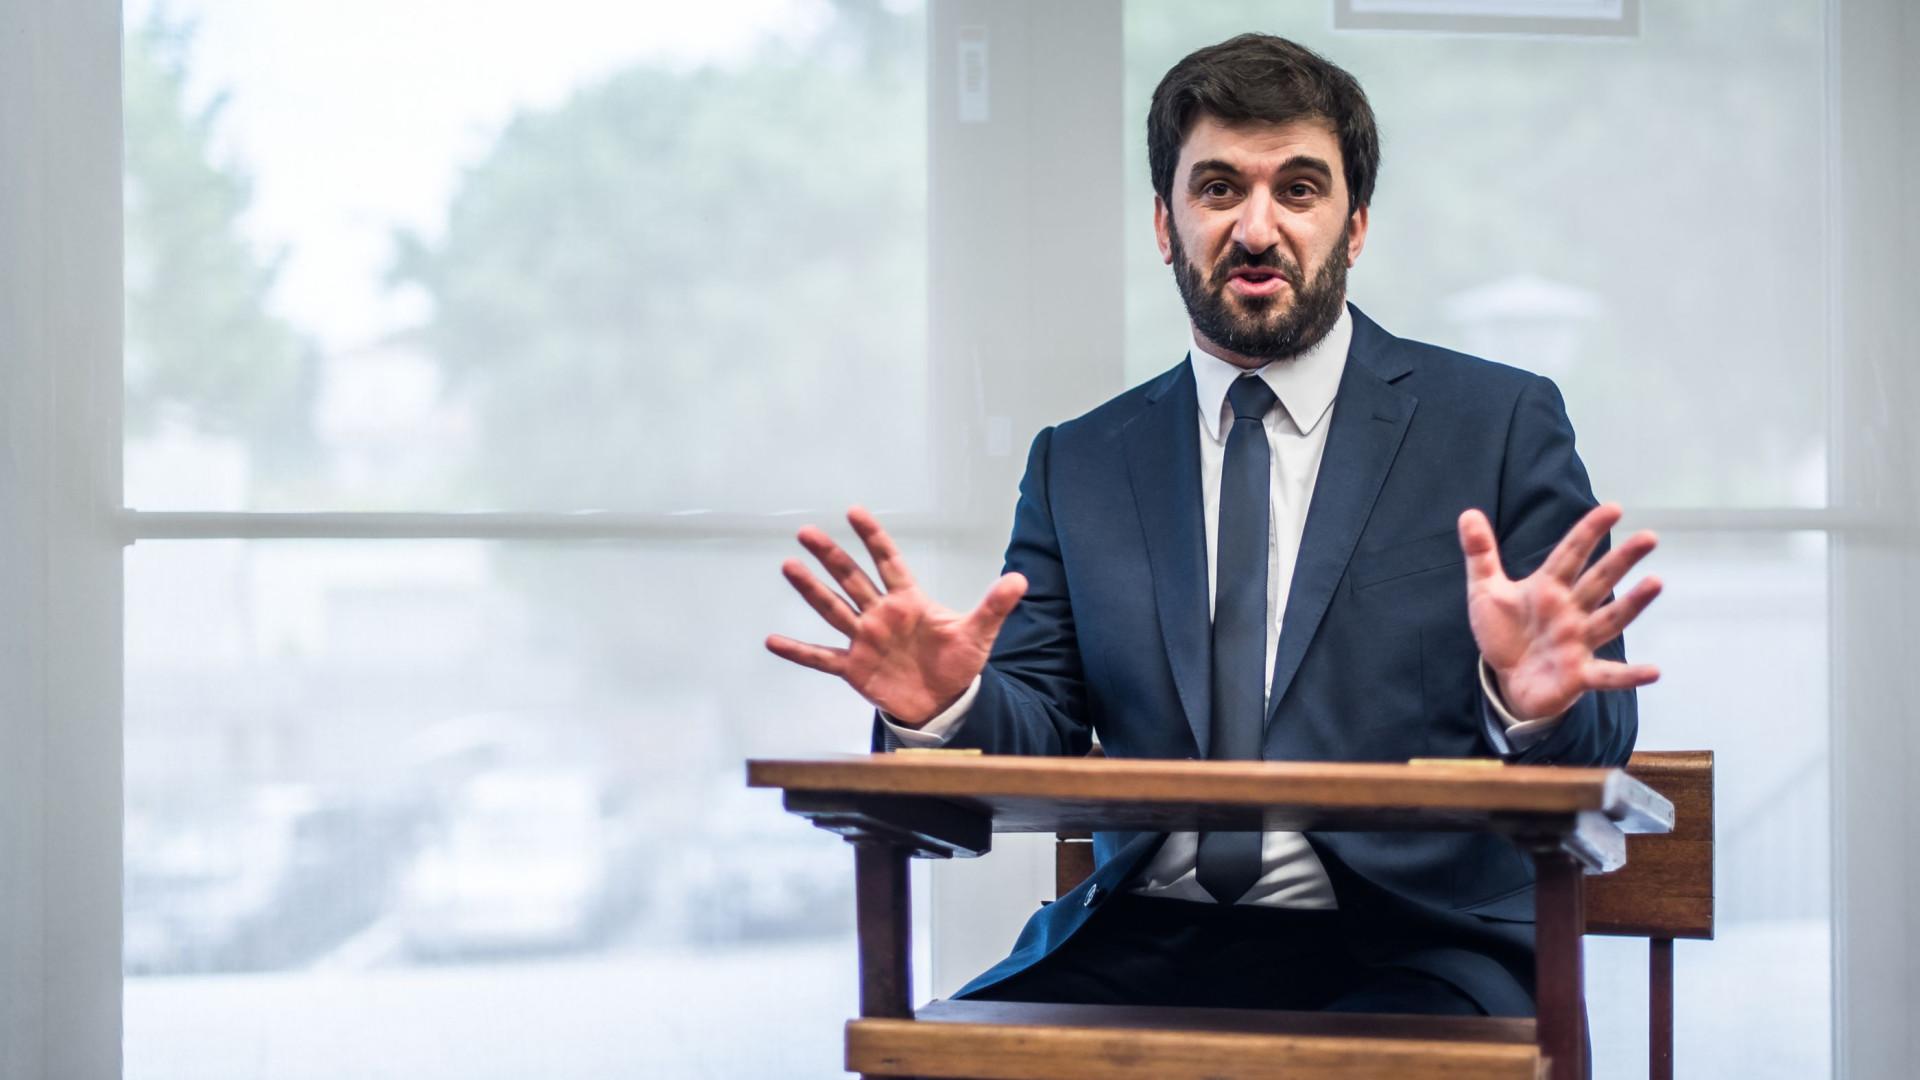 Ministério pede esclarecimentos sobre inquérito polémico feito a alunos